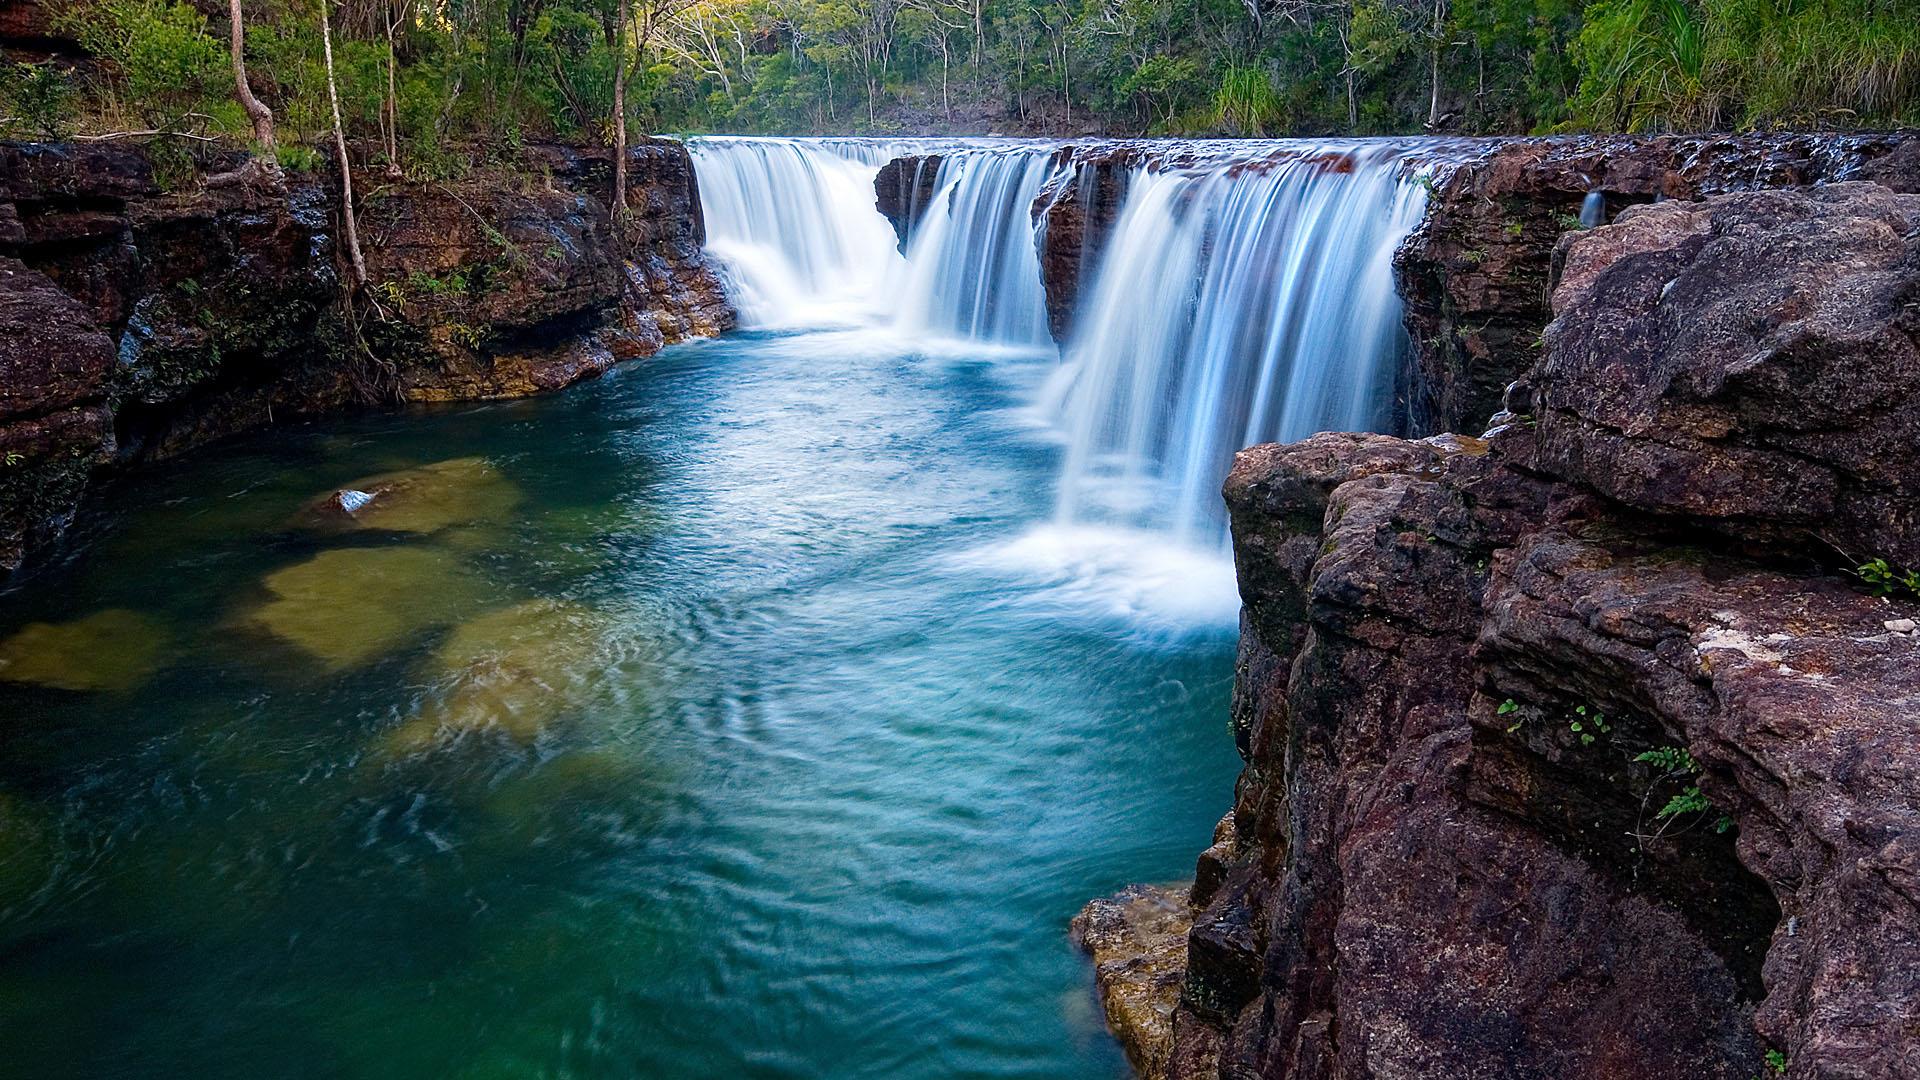 Download Wallpapers Waterfalls Waterfall Desktop Picture 1920x1080